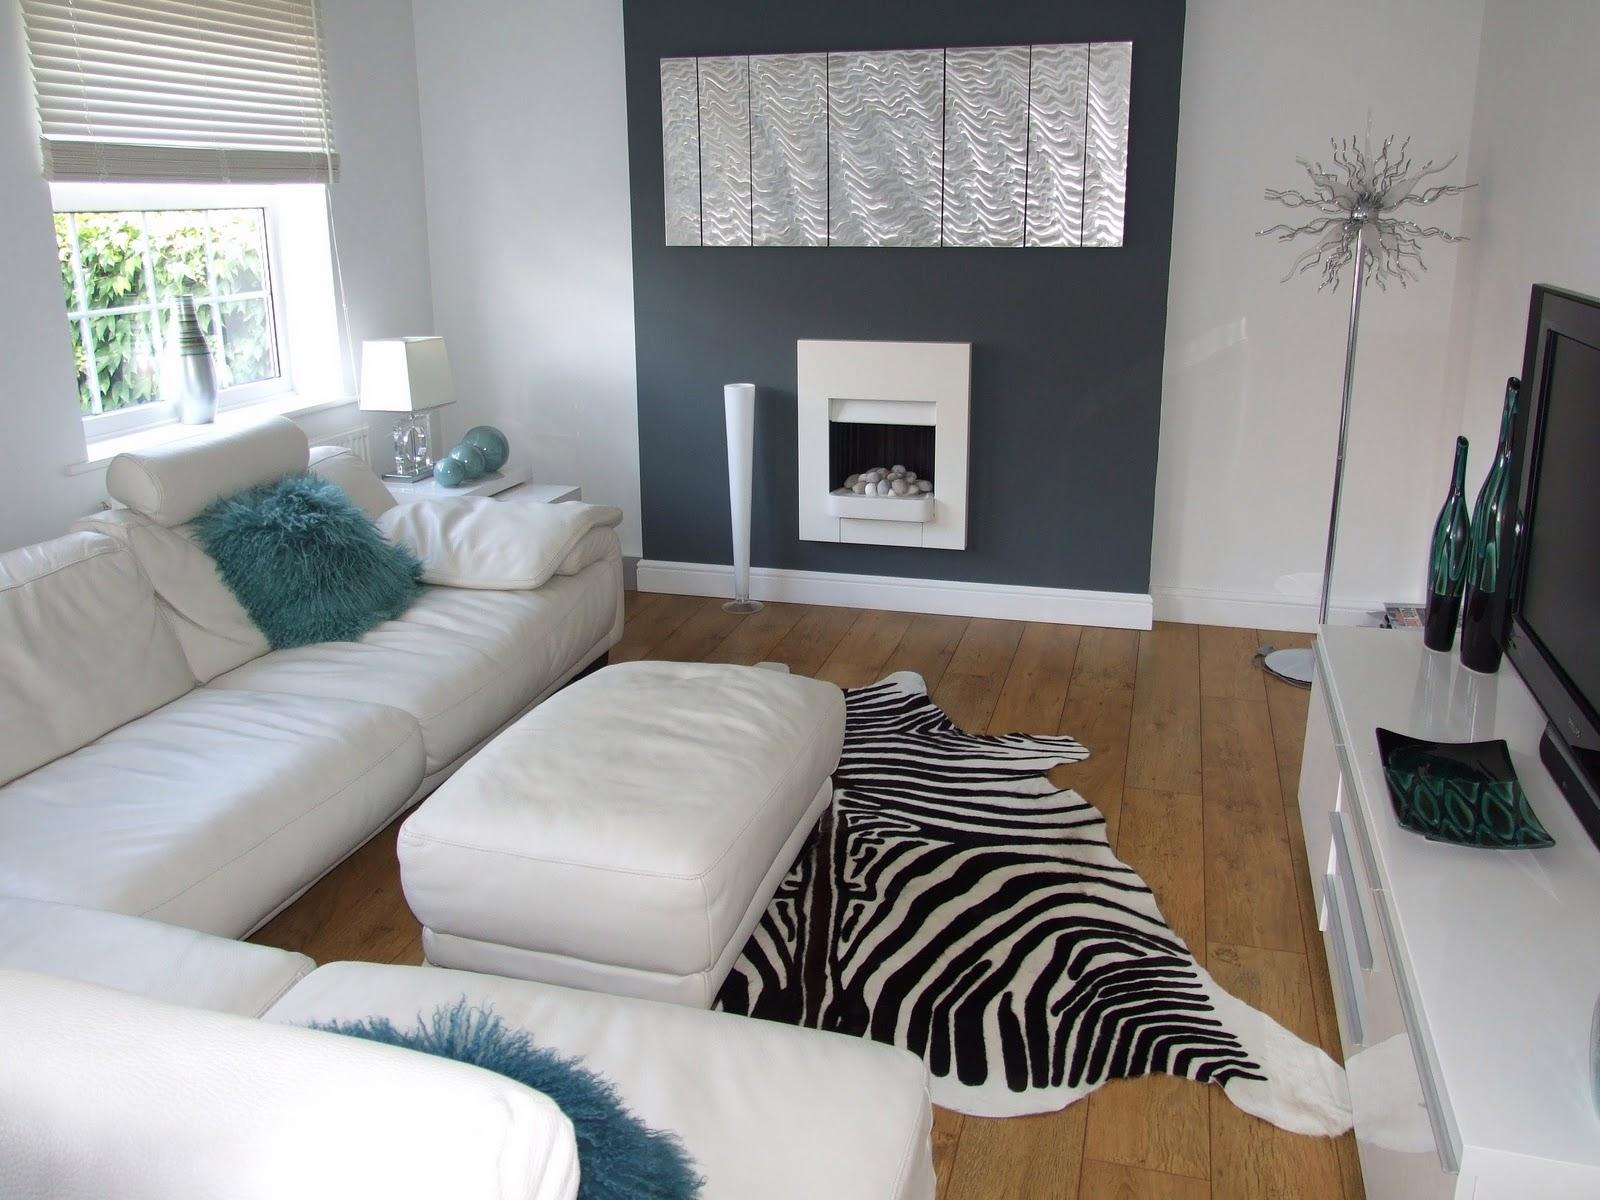 room wall design ideas living room designs thepsycheofmikey blogspot 1600x1200